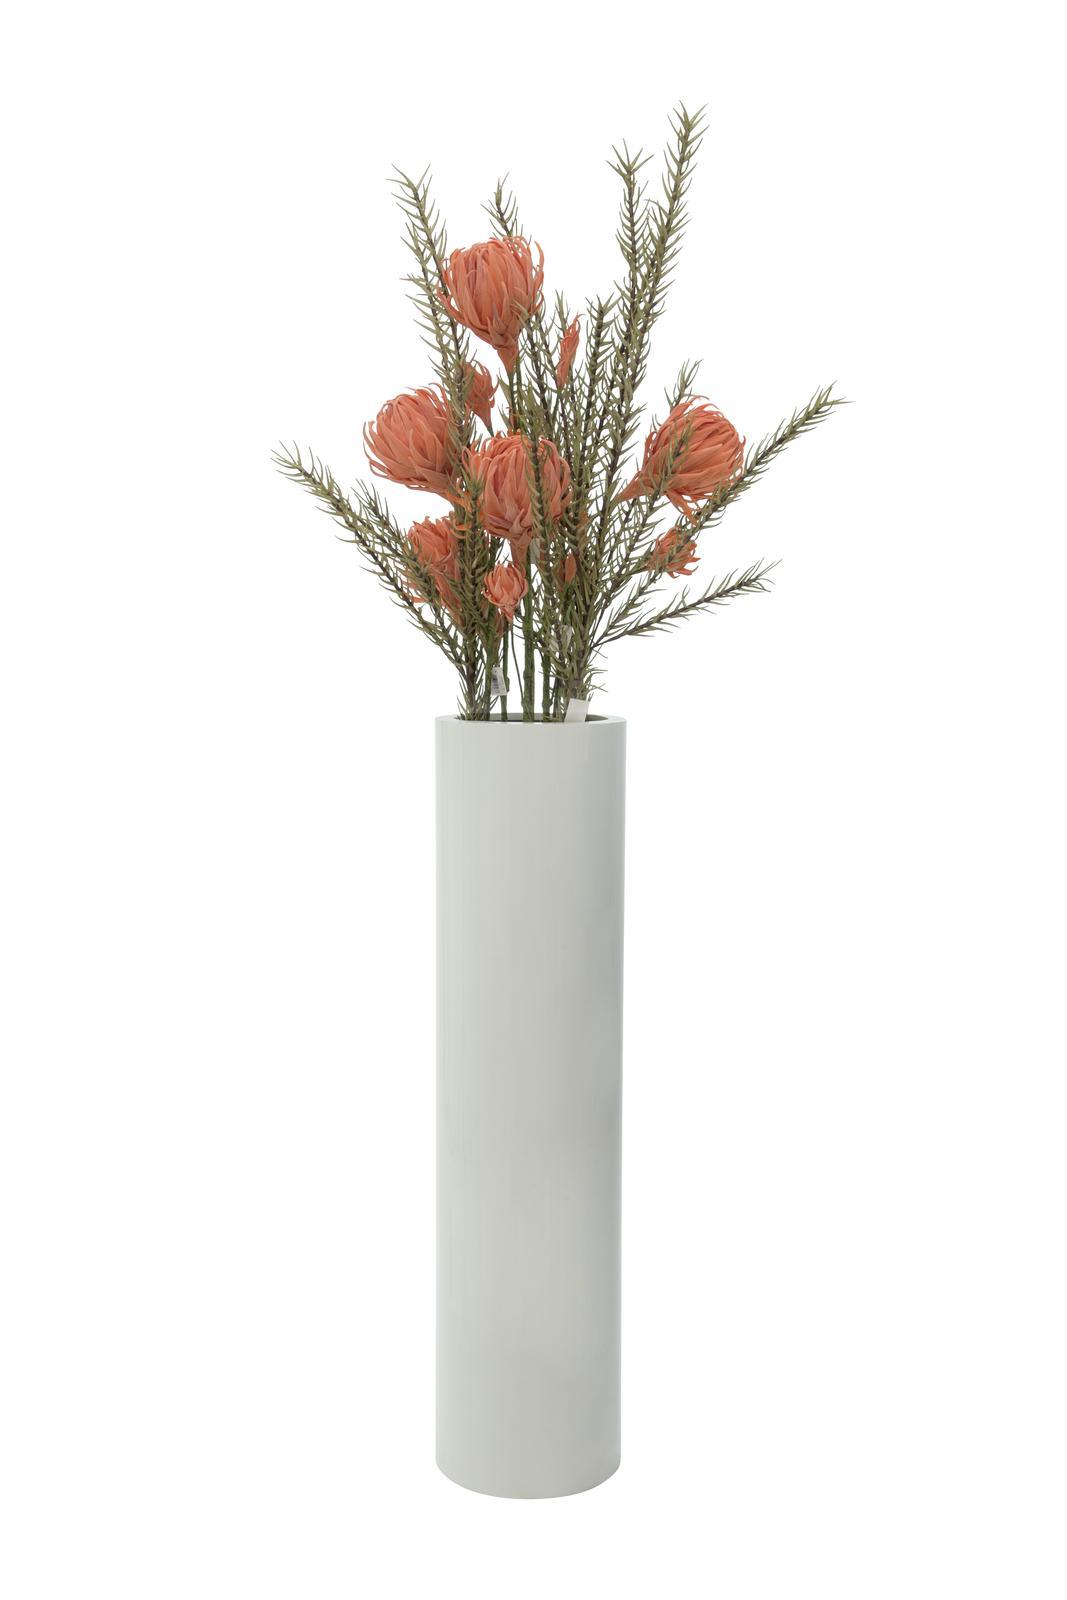 Europalms leichtsin tower 120 shiny white su for Vasi in terracotta economici